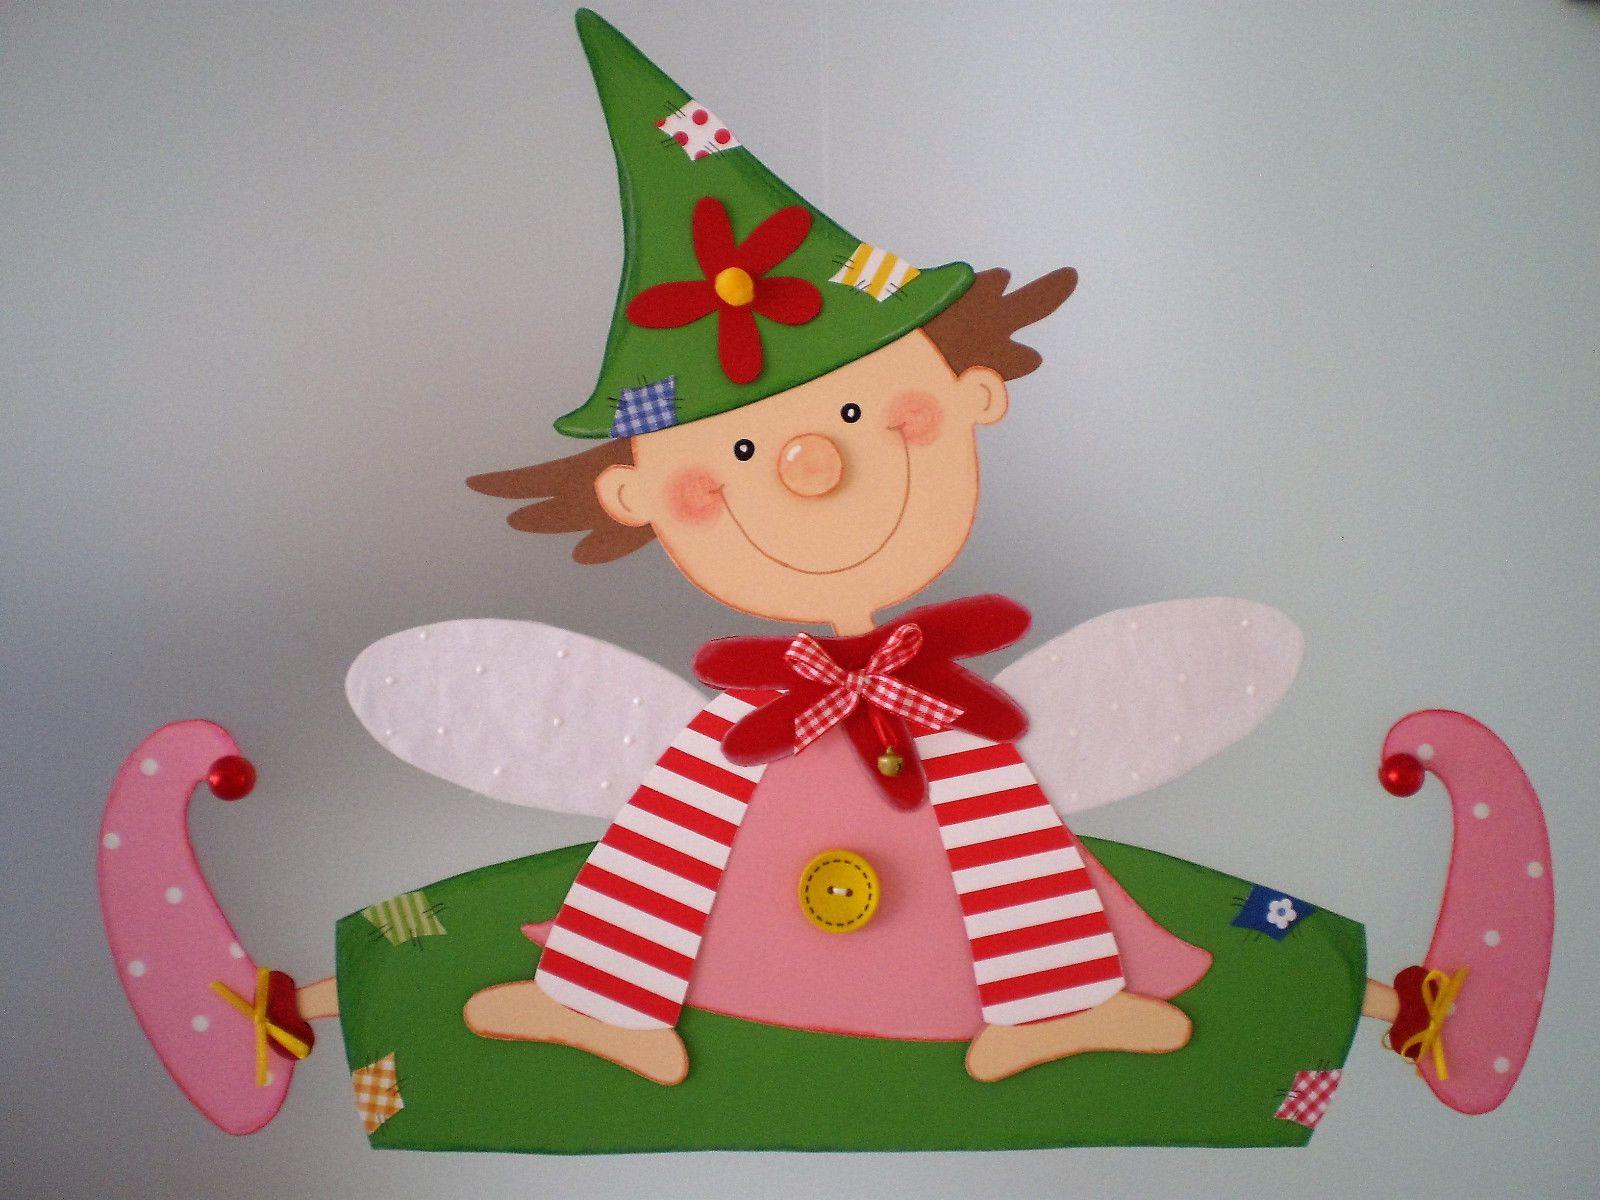 Fensterbild   Süßer Wichtel   Elfe   Kinderzimmer   Dekoration   Tonkarton!  FOR SALE U2022